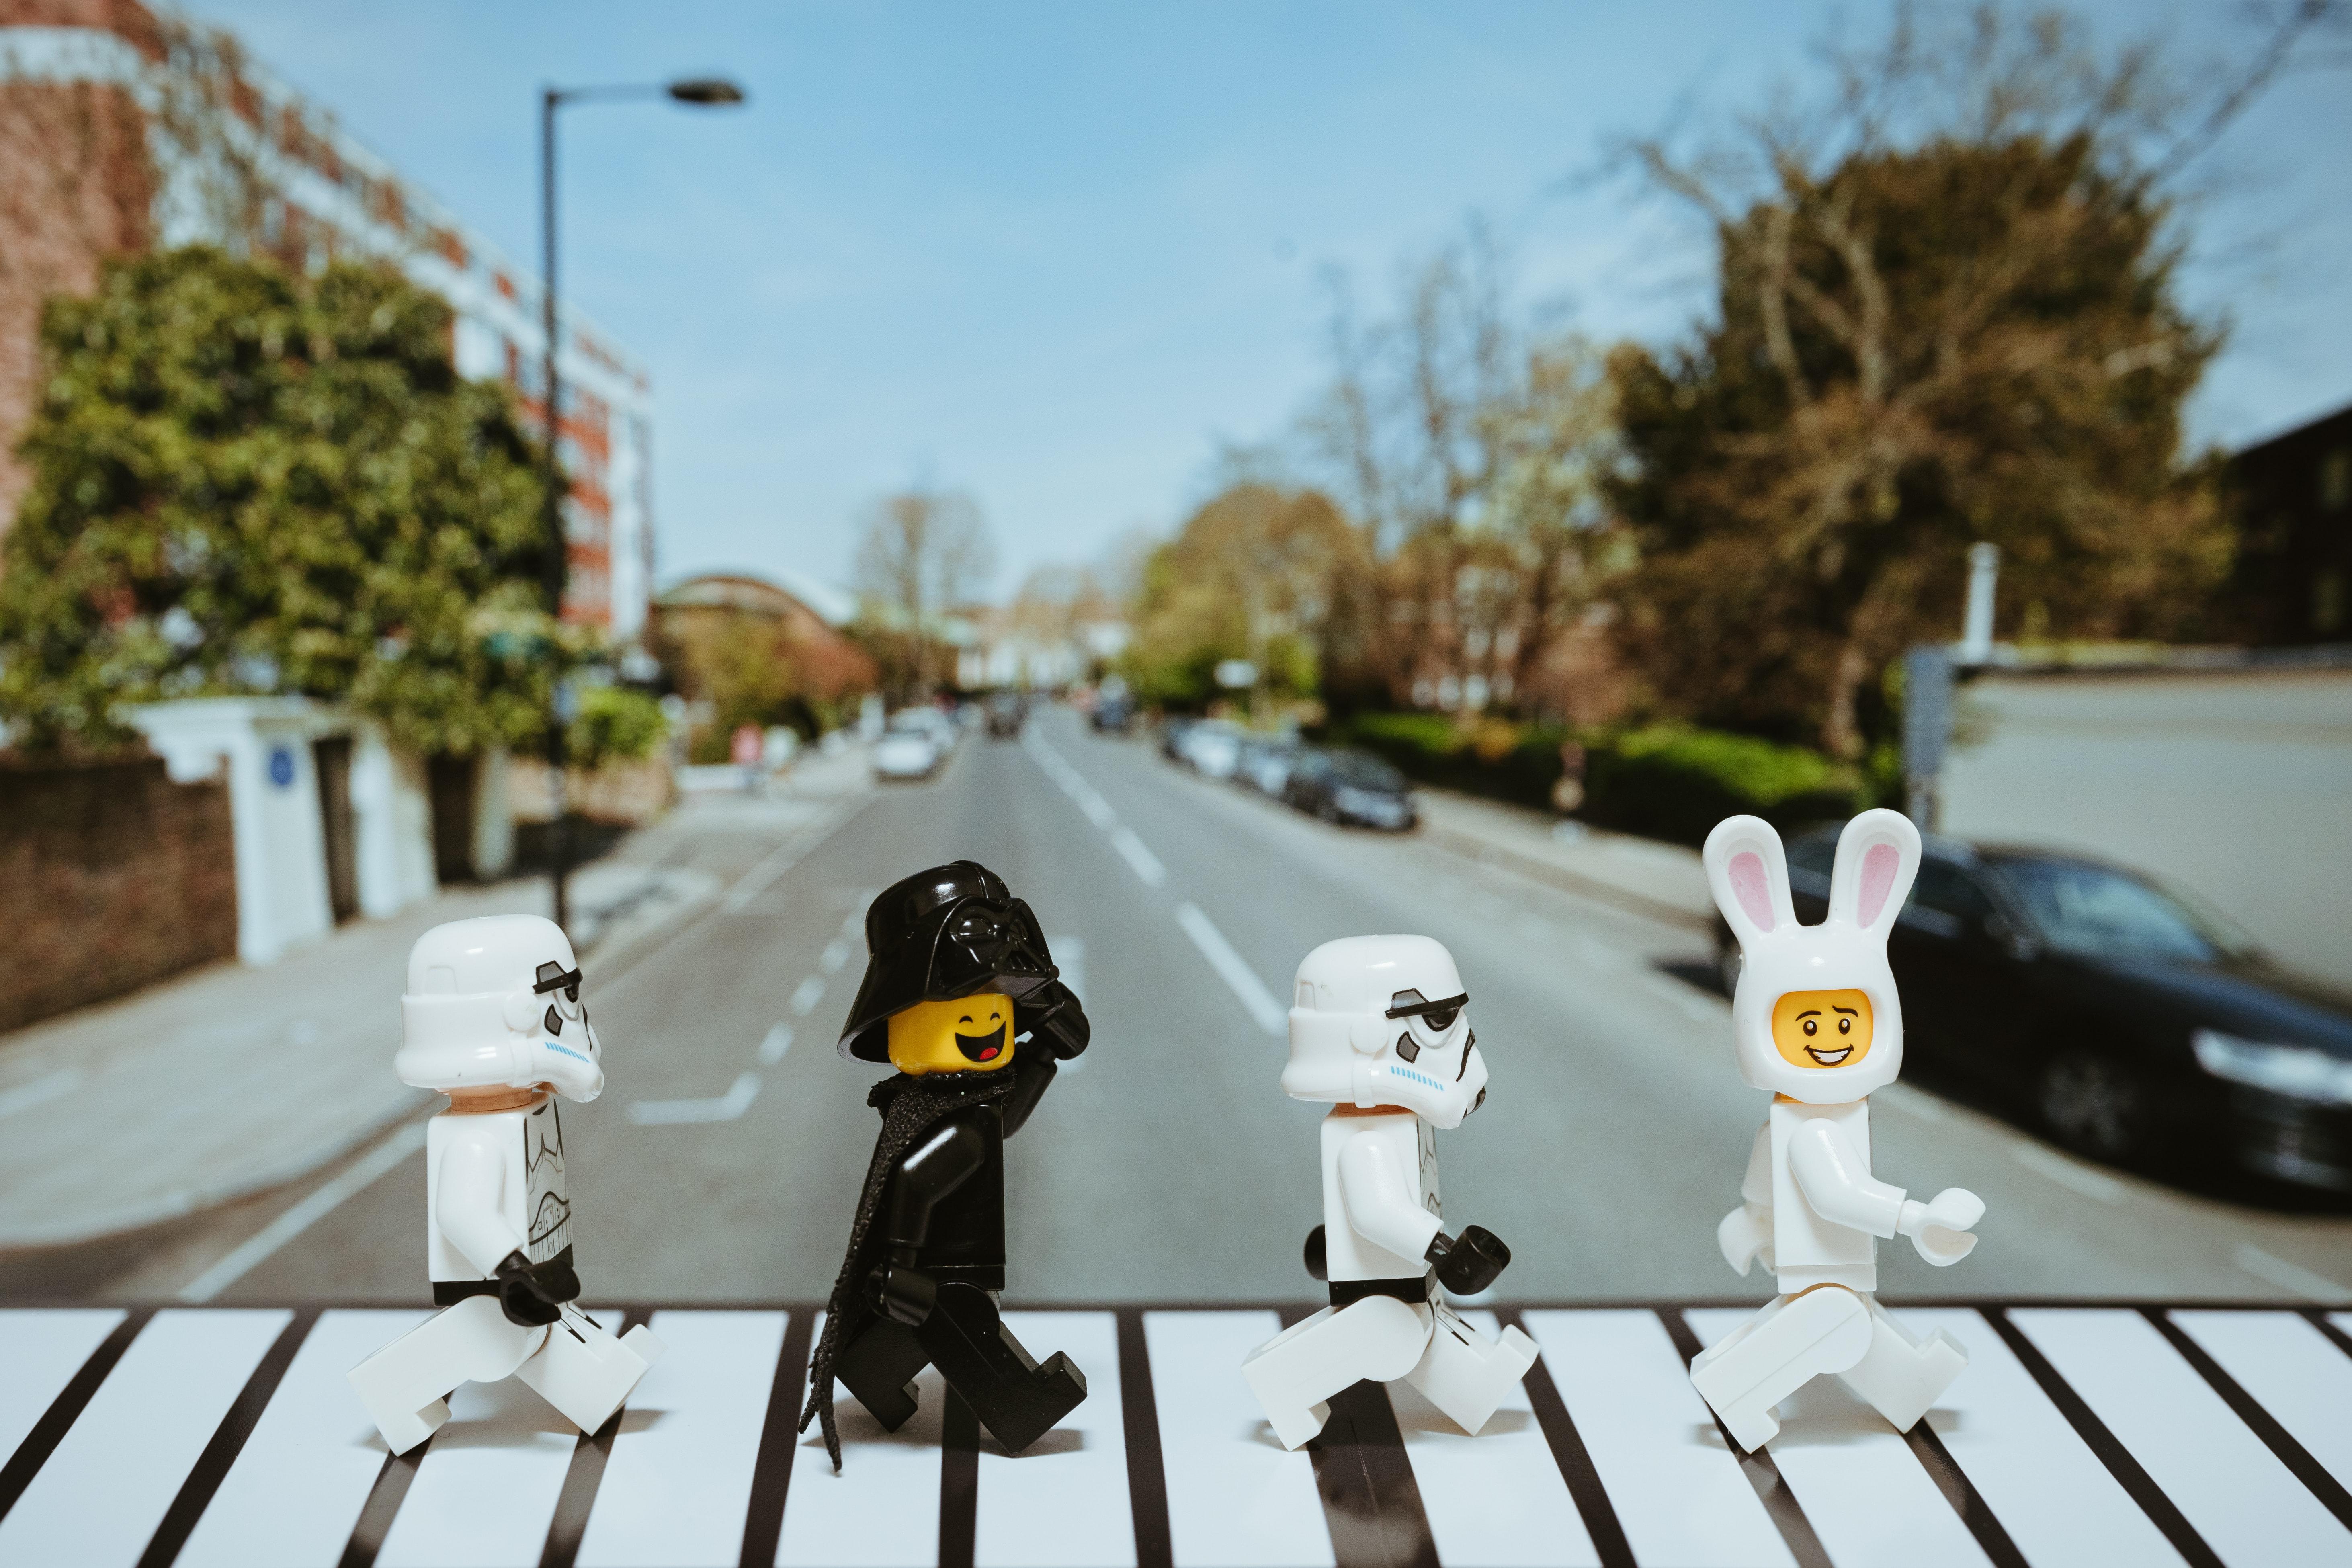 Lego Buildings Credit Daniel Cheung via Unsplash